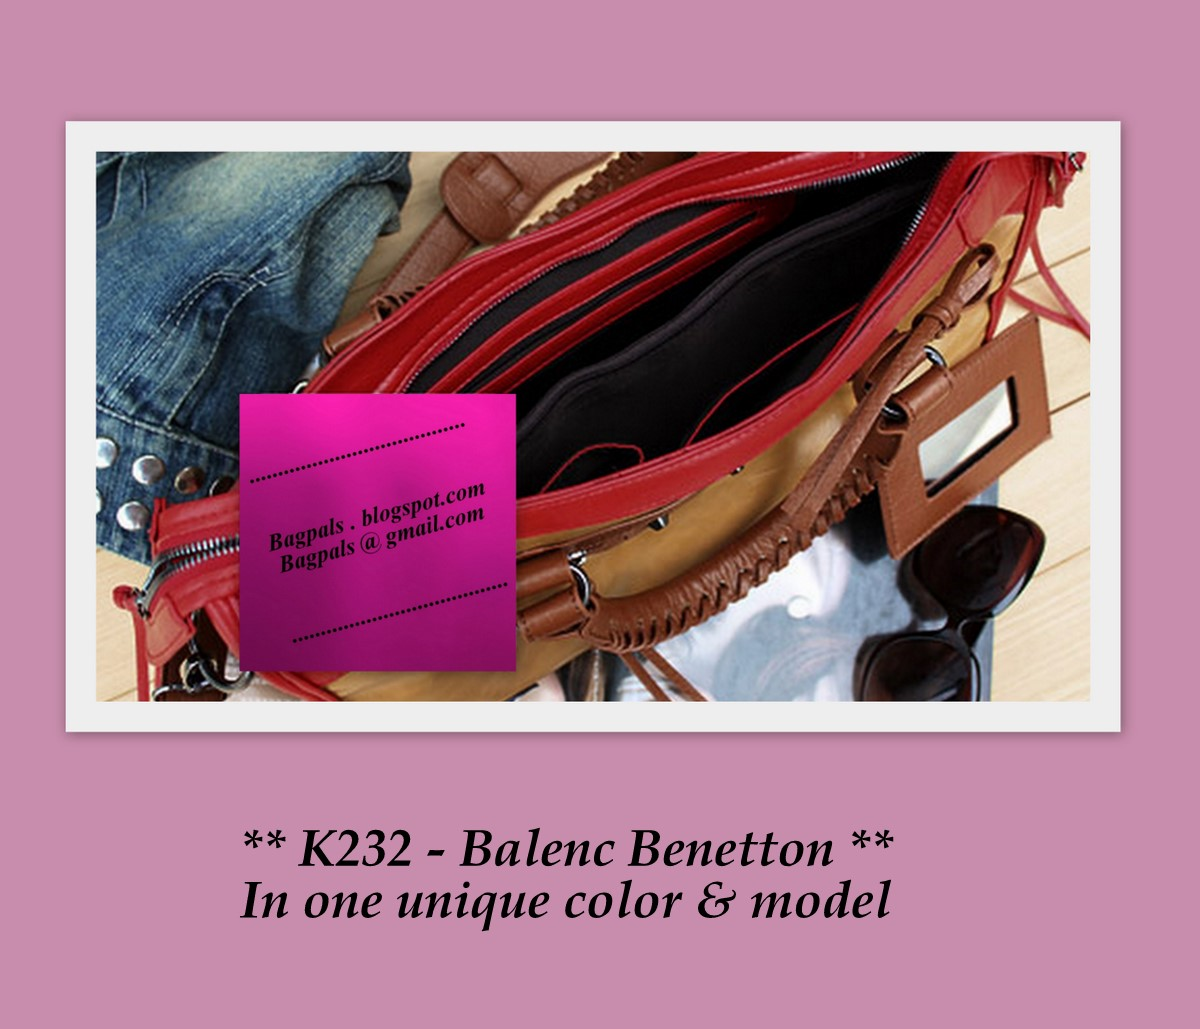 Bagpals online store k232 balenc benetton 36 for Shop online benetton